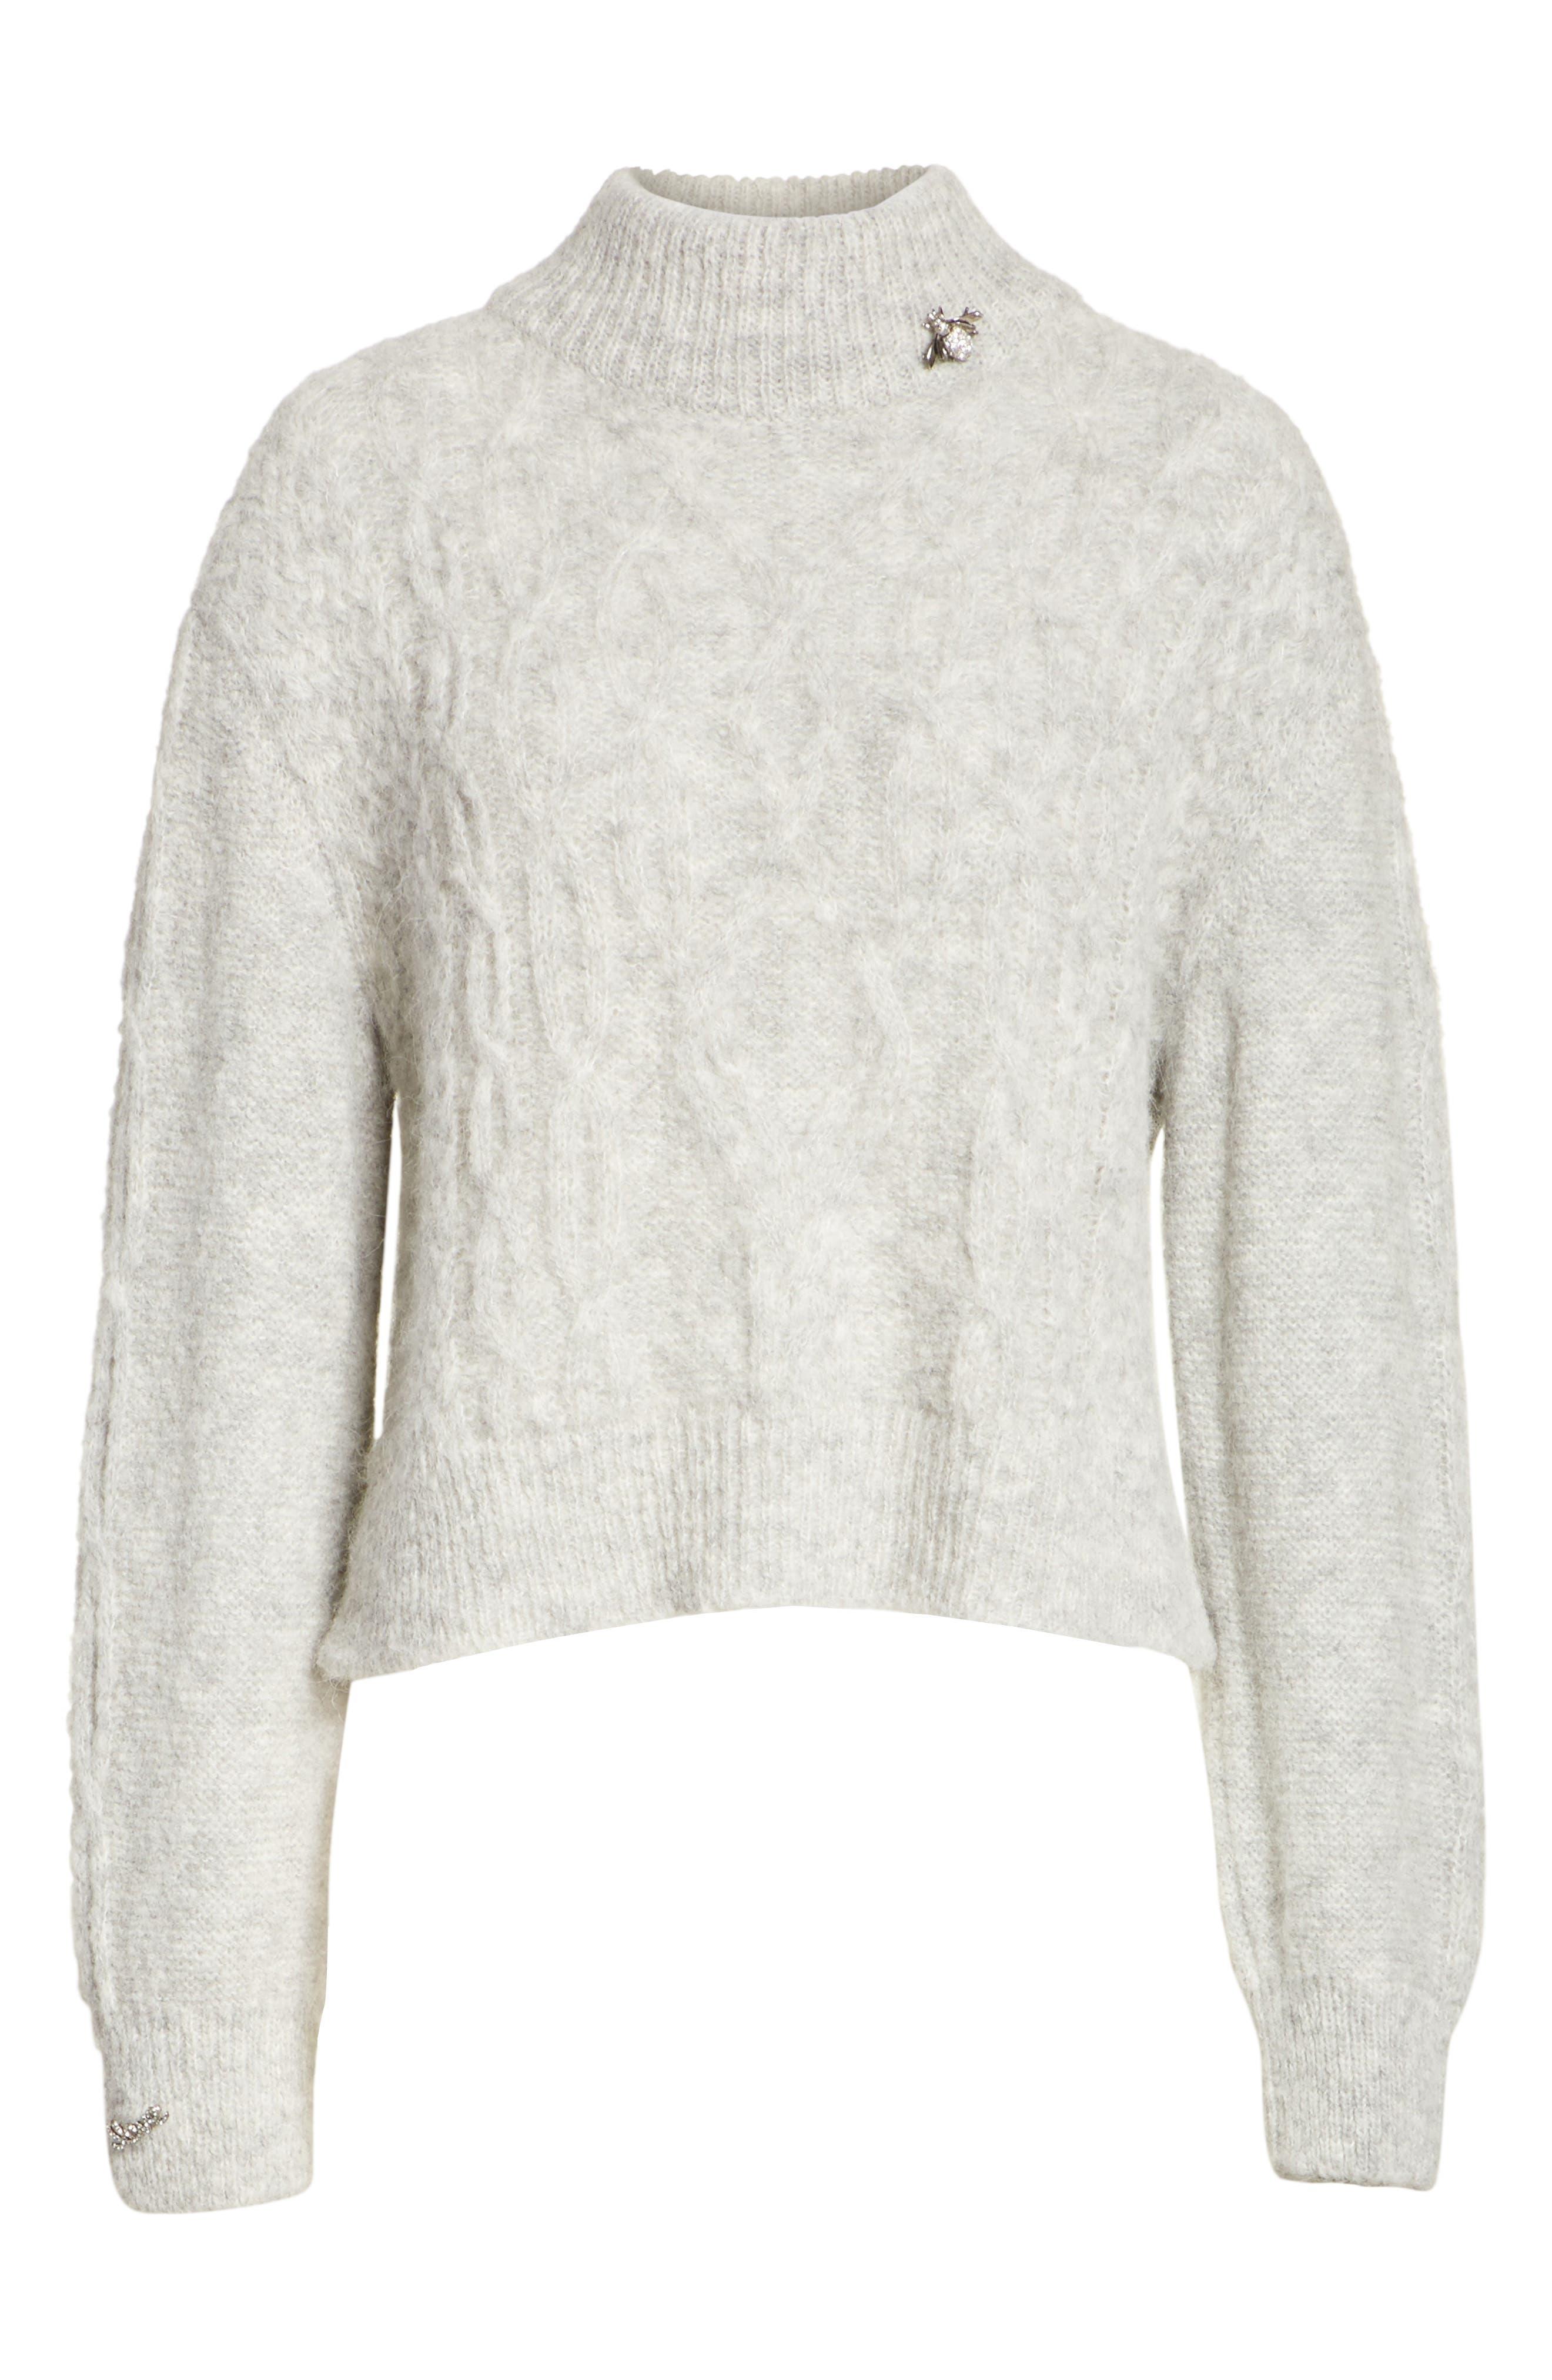 Garlan Mock Neck Sweater,                             Alternate thumbnail 6, color,                             Light Heather Grey